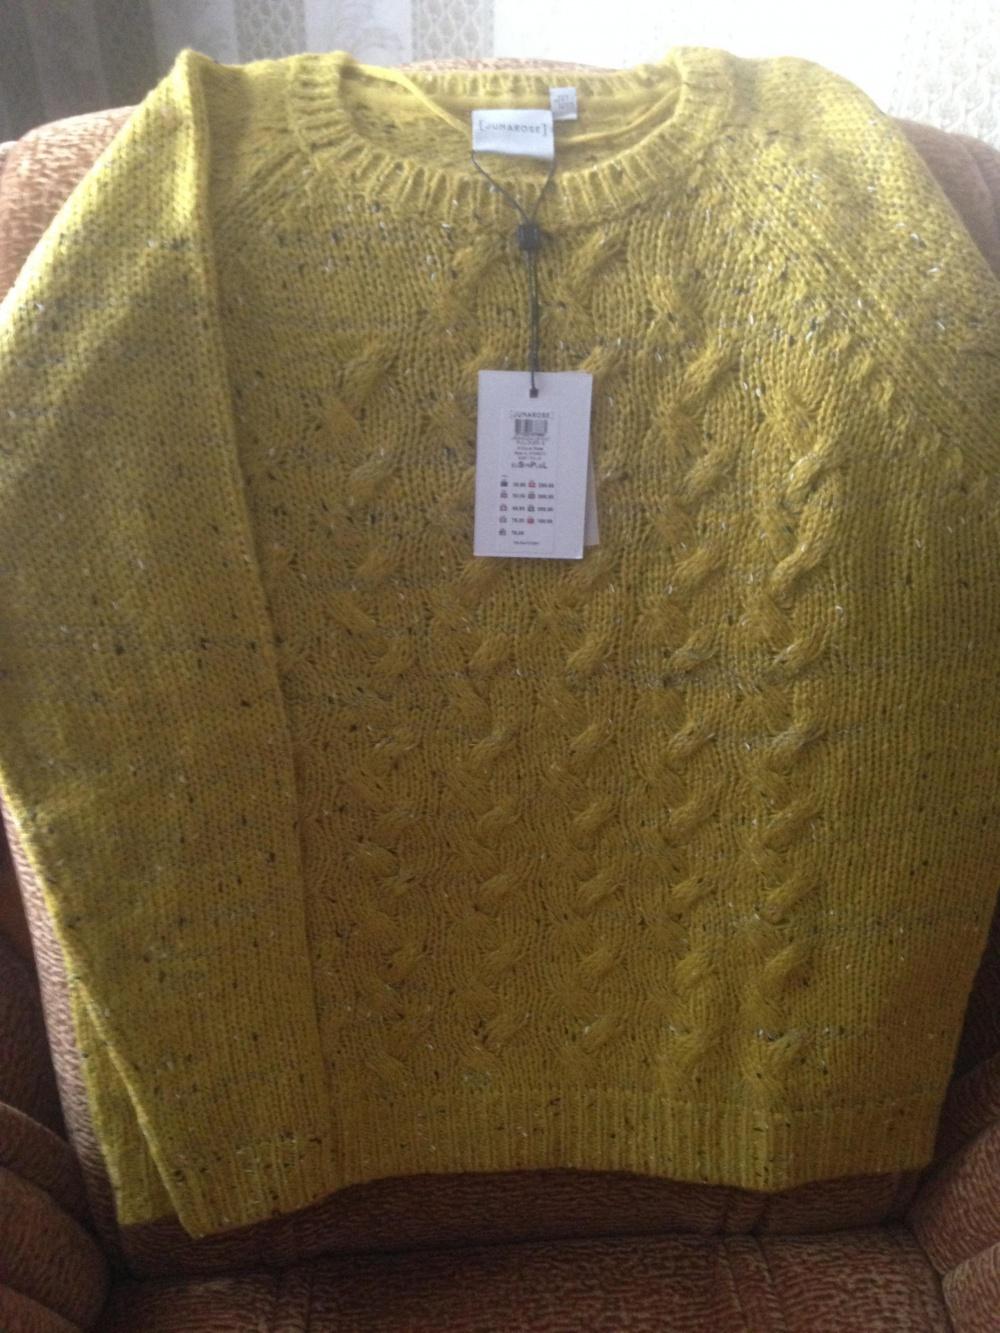 Свитер яркого горчичного цвета Junarose Criss Cross Knit Jumper, UK 14